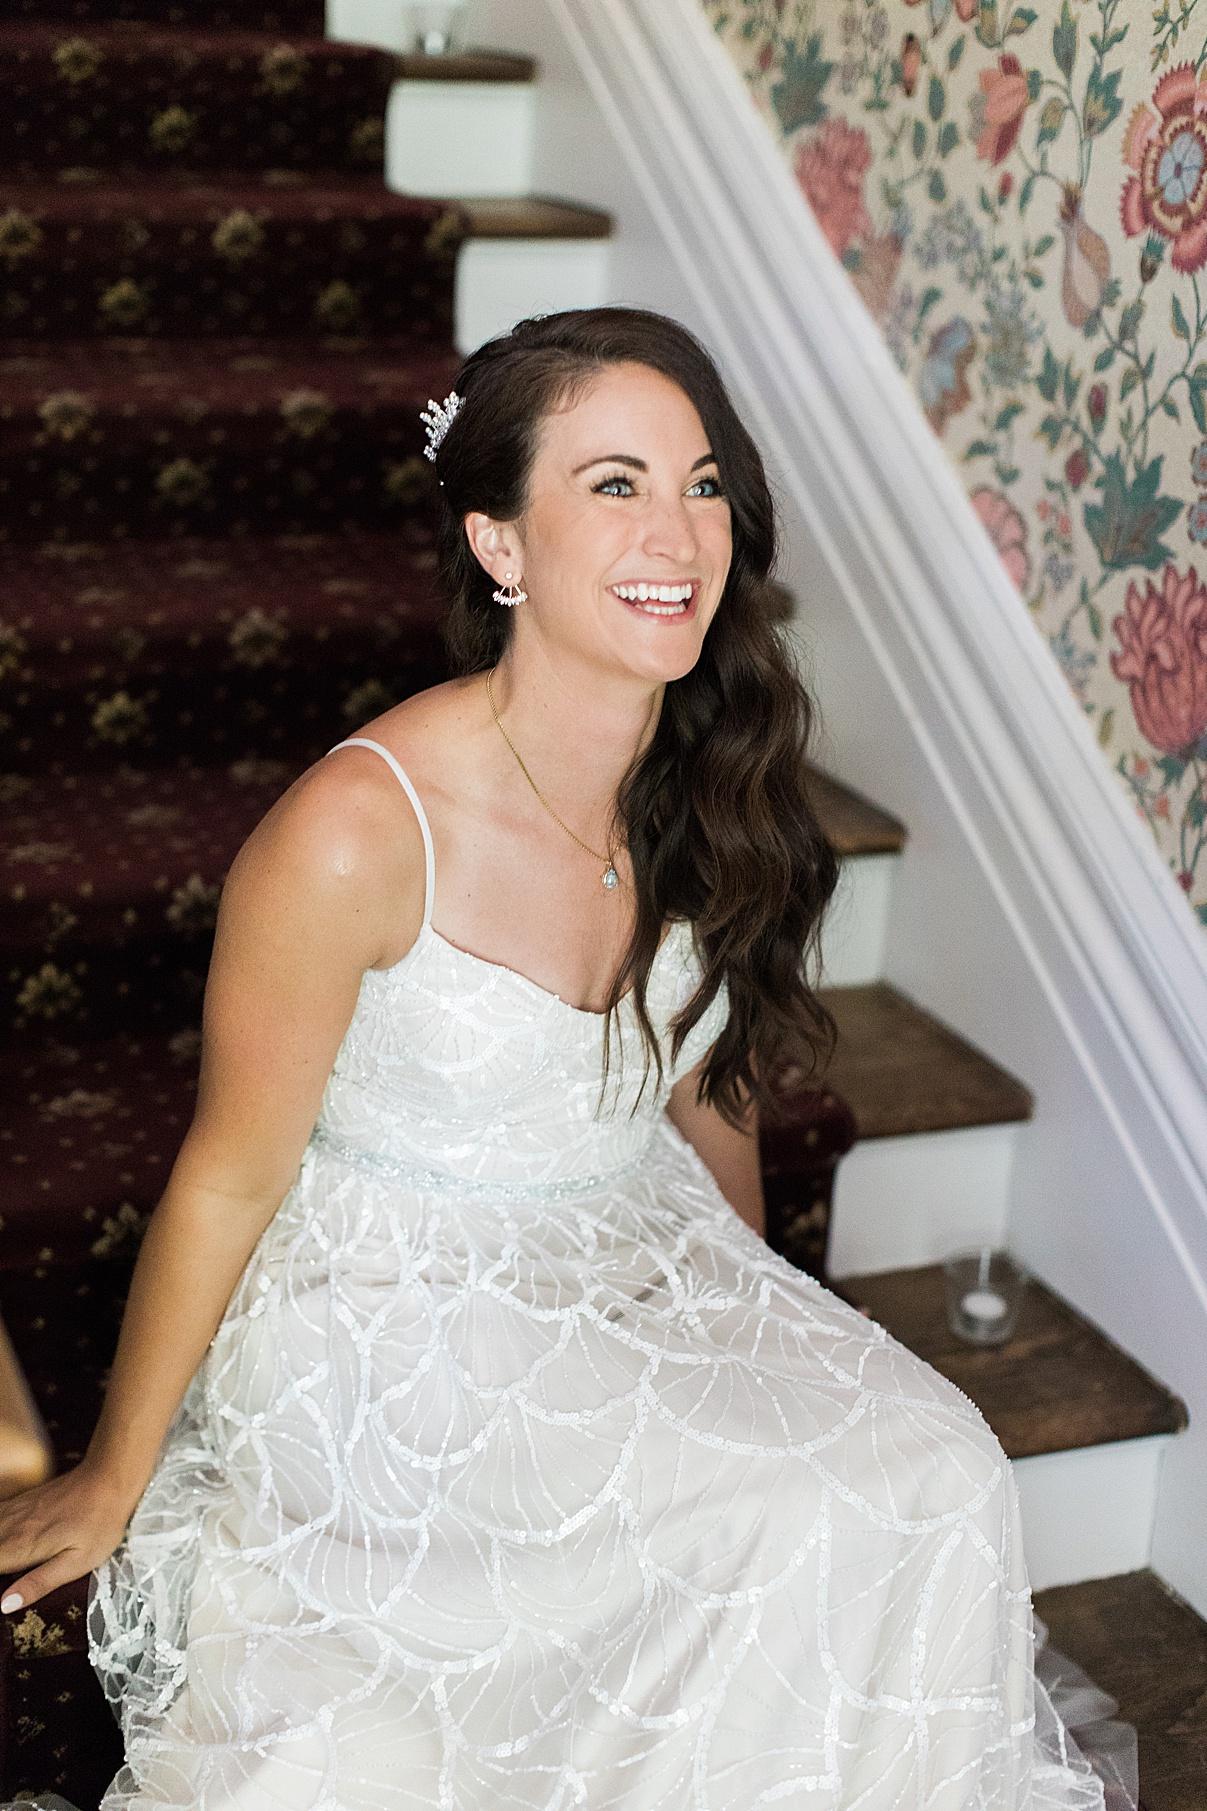 Bride smiling on stairs| Balls Falls, Ontario Wedding| Ontario Wedding Photographer| Toronto Wedding Photographer| 3Photography|3photography.ca